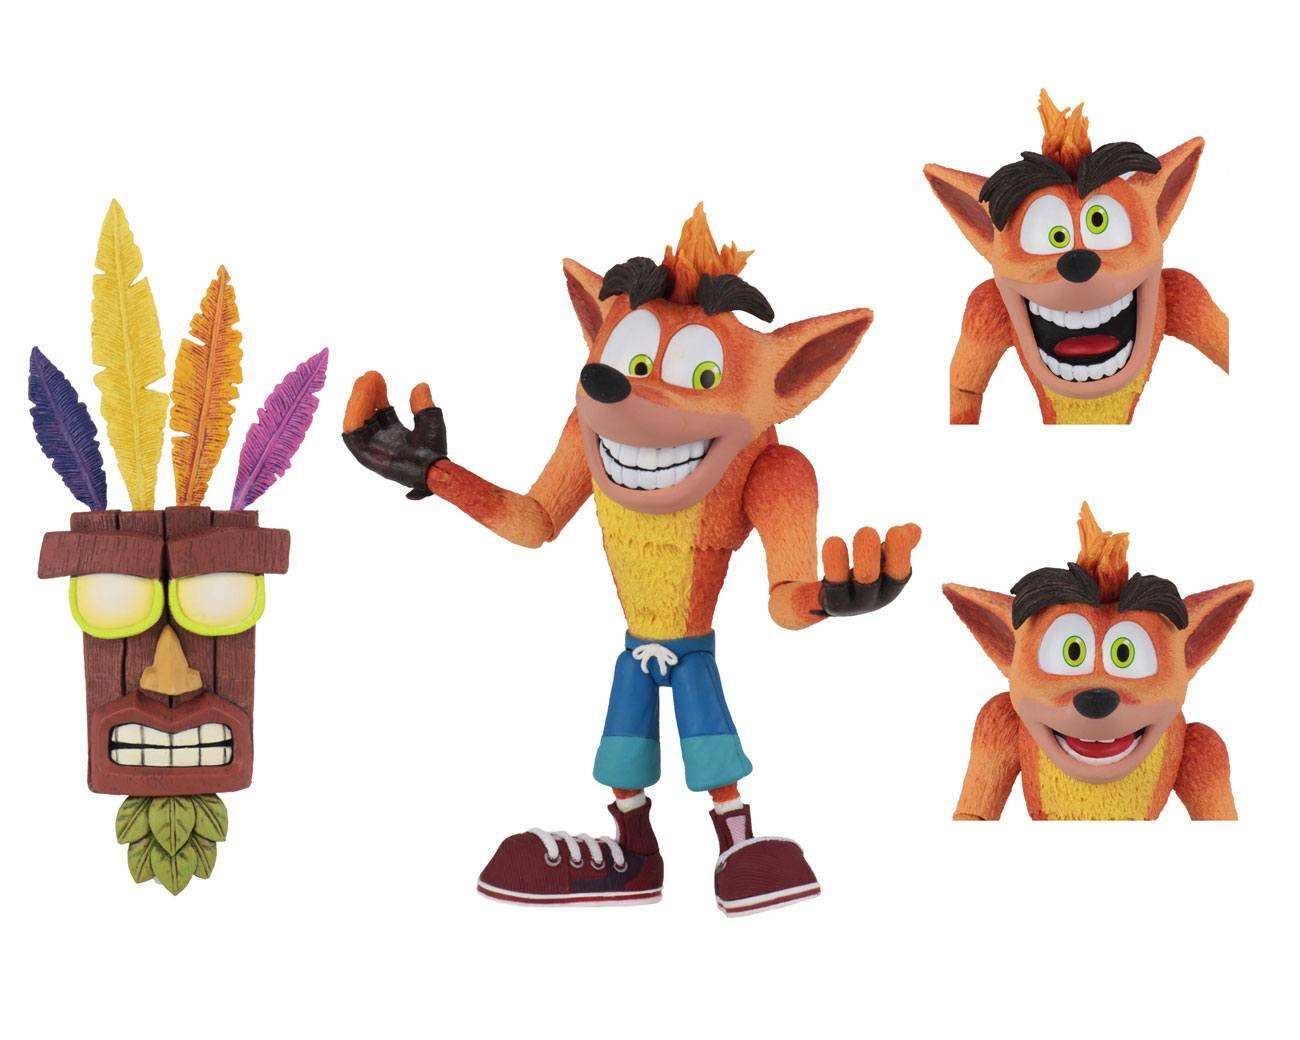 Crash Bandicoot Ultra Deluxe Action Figure Crash with Aku Aku Mask 14 cm